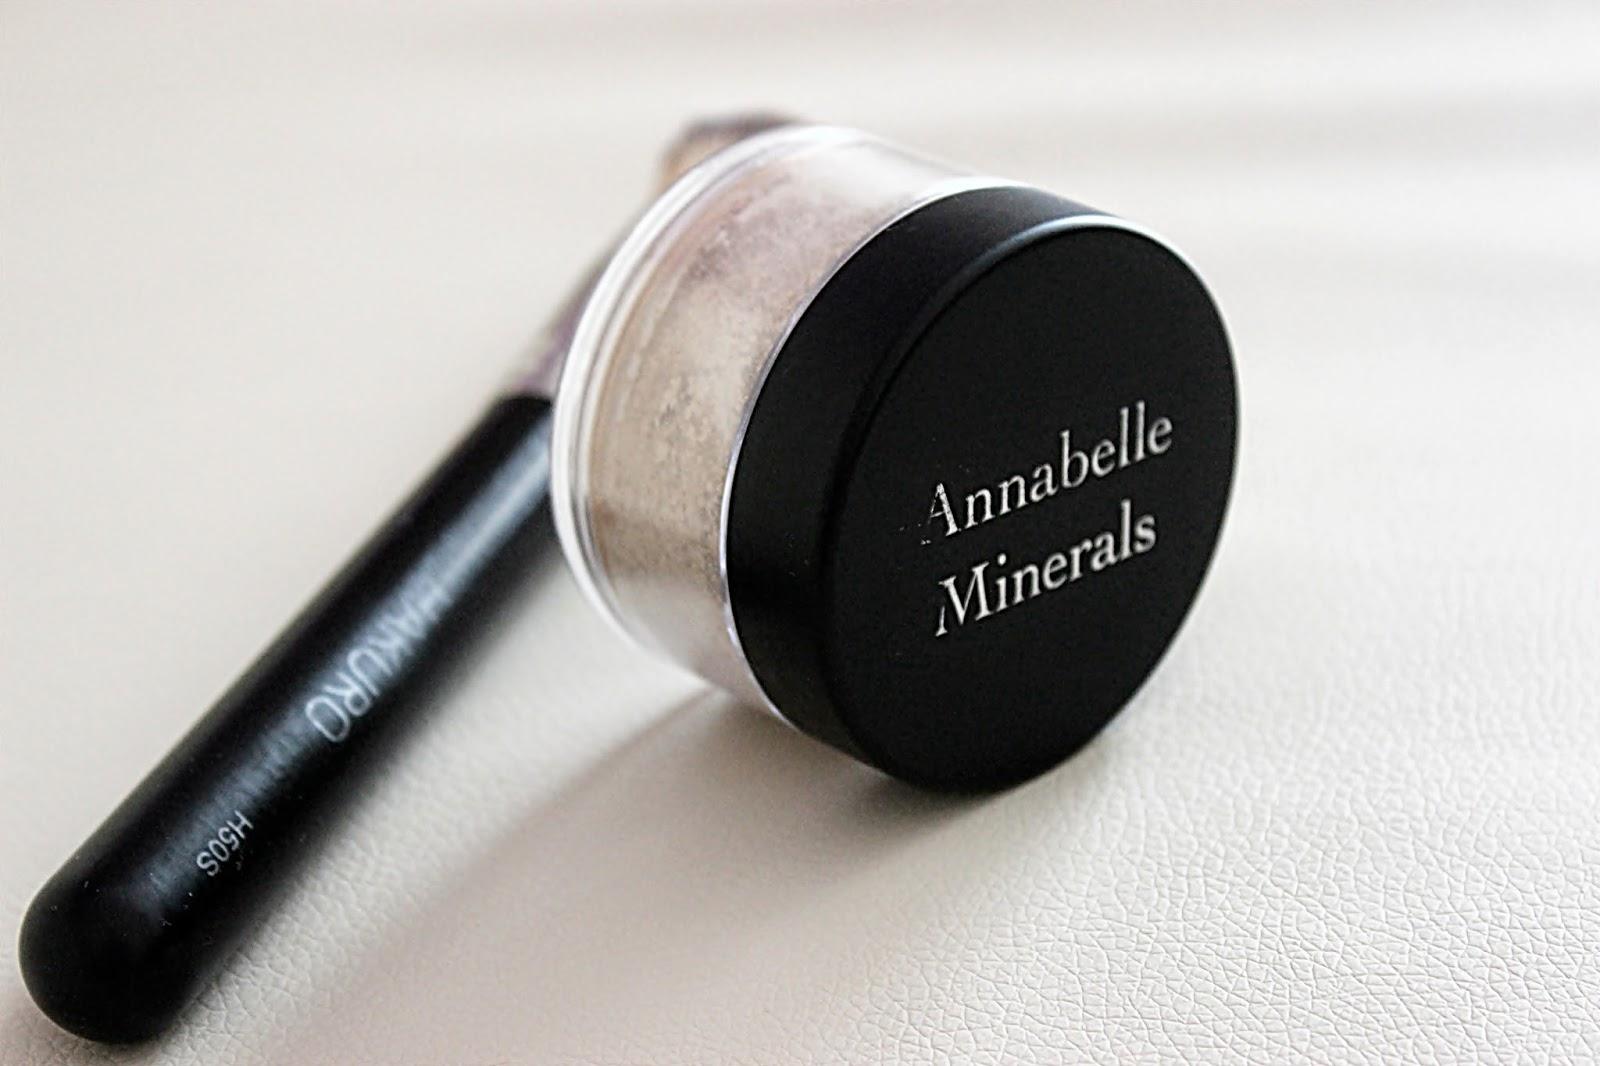 Annabelle Minerals, pędzel Hakuro, podkład mineralny